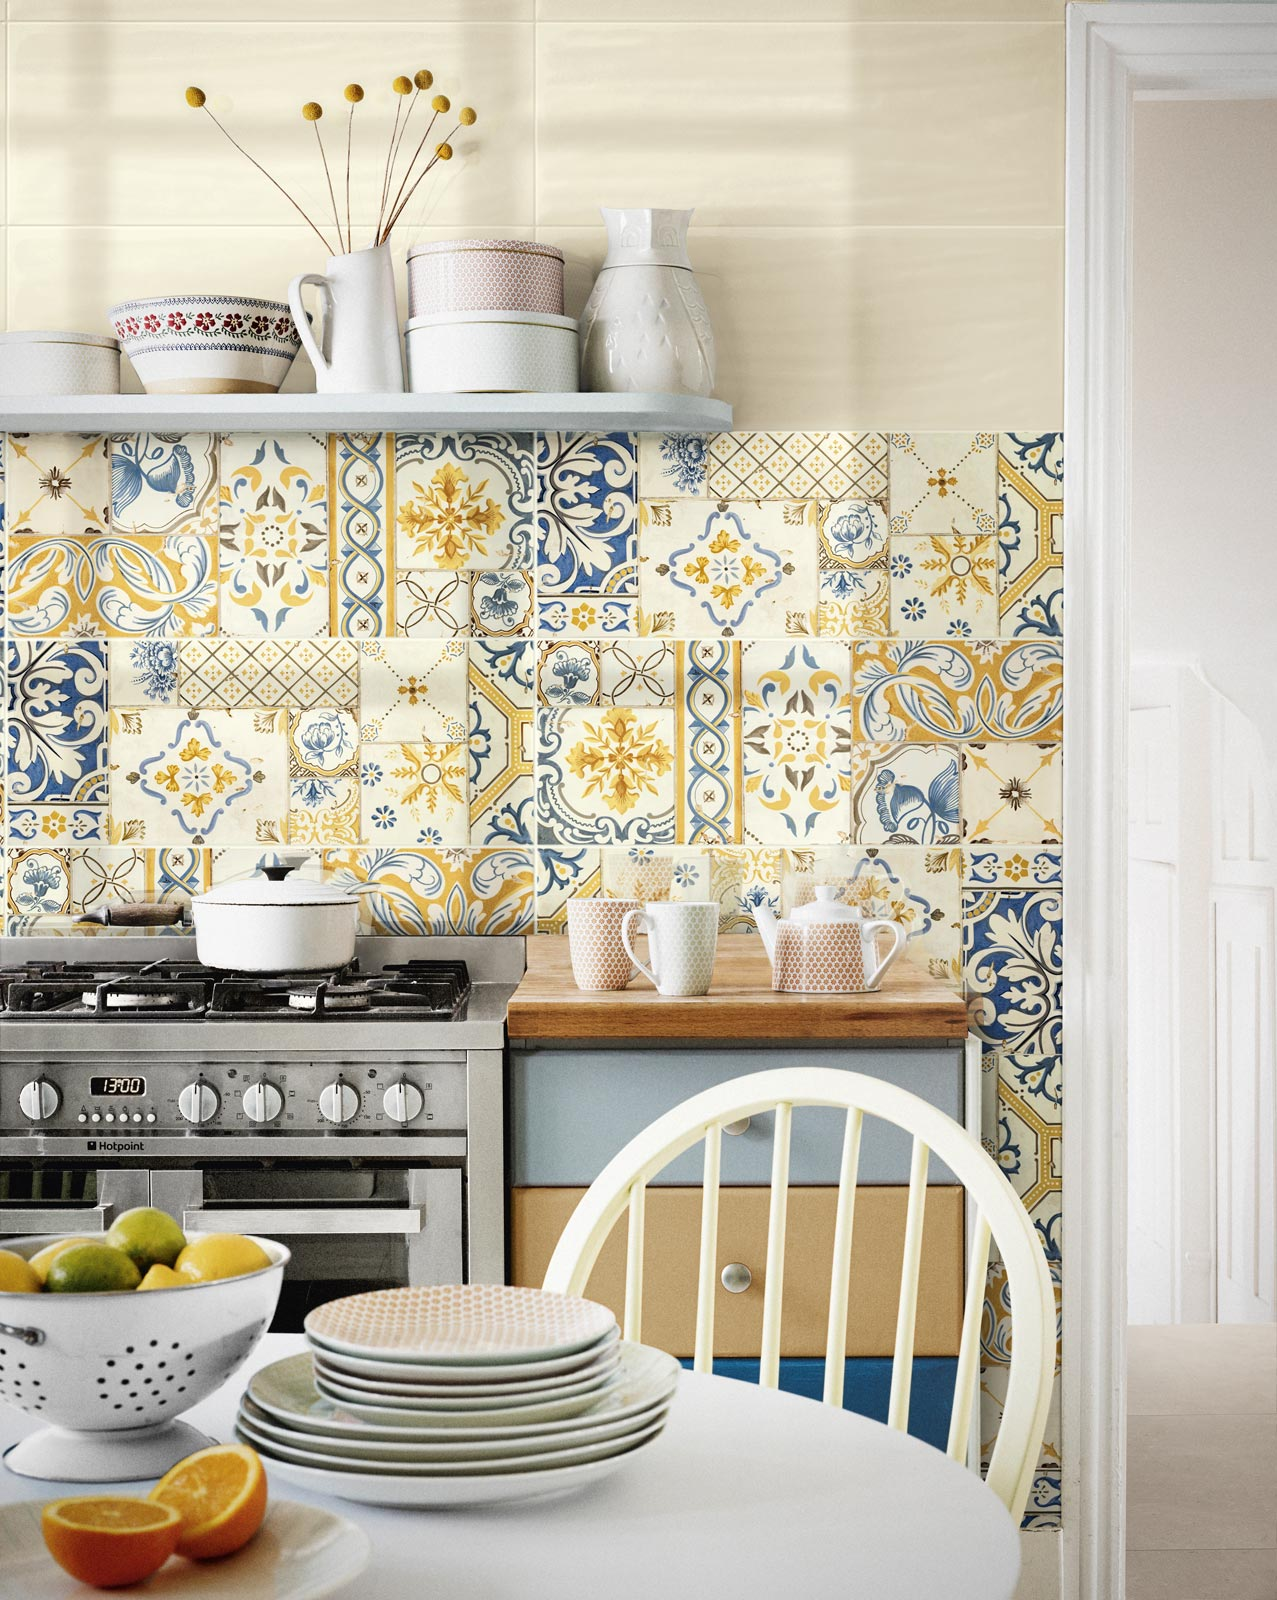 Piastrelle colorate per cucina piastrelle cucina glitter cucine